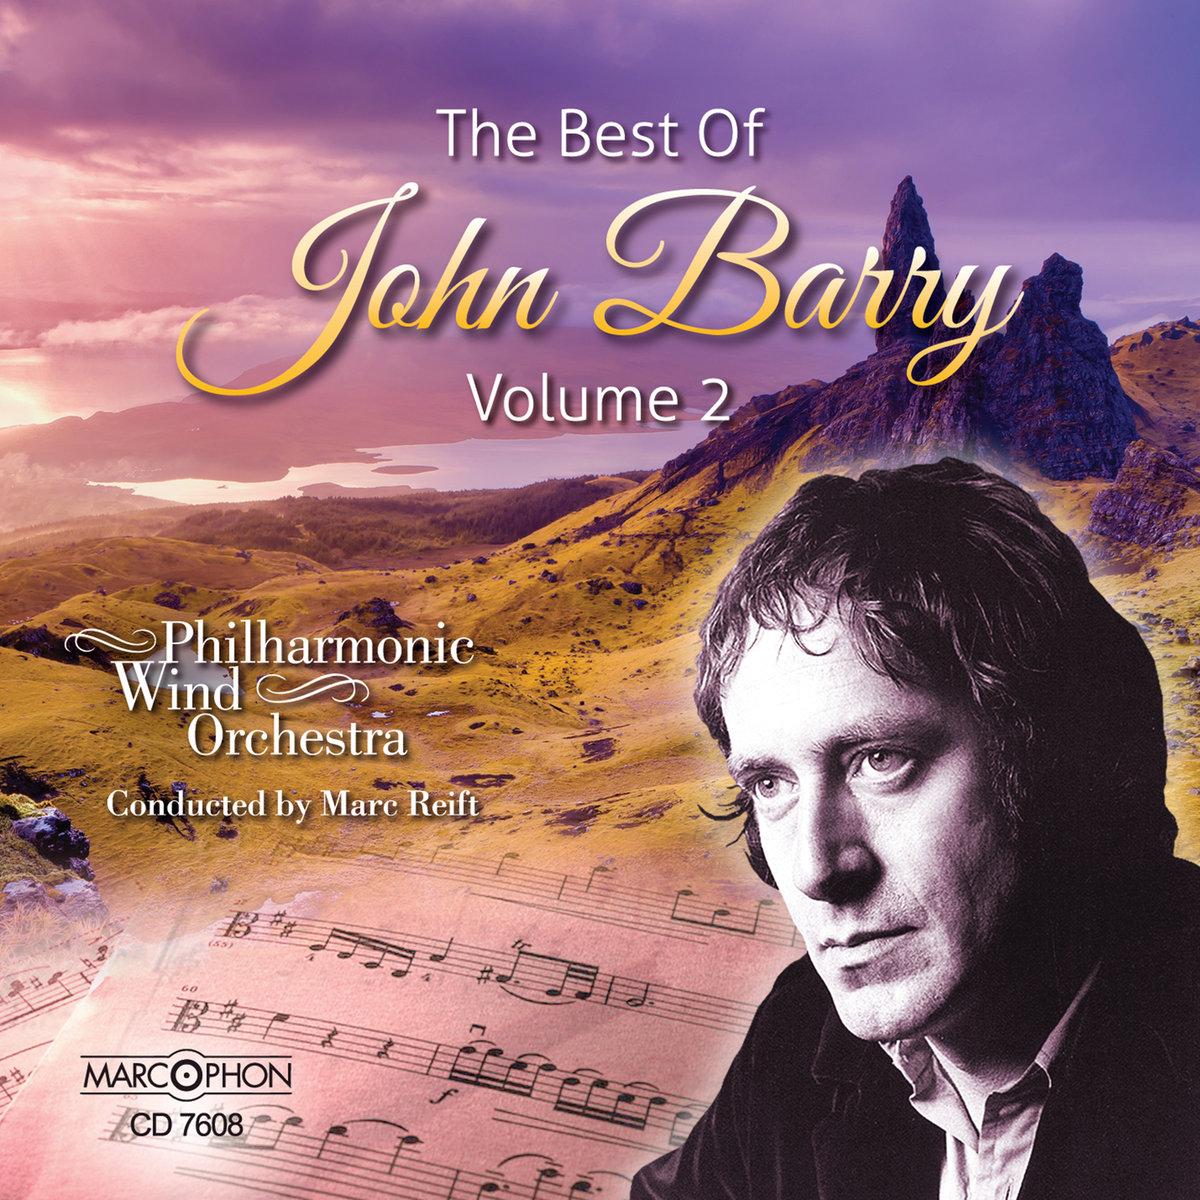 The Best Of John Barry, Volume 2